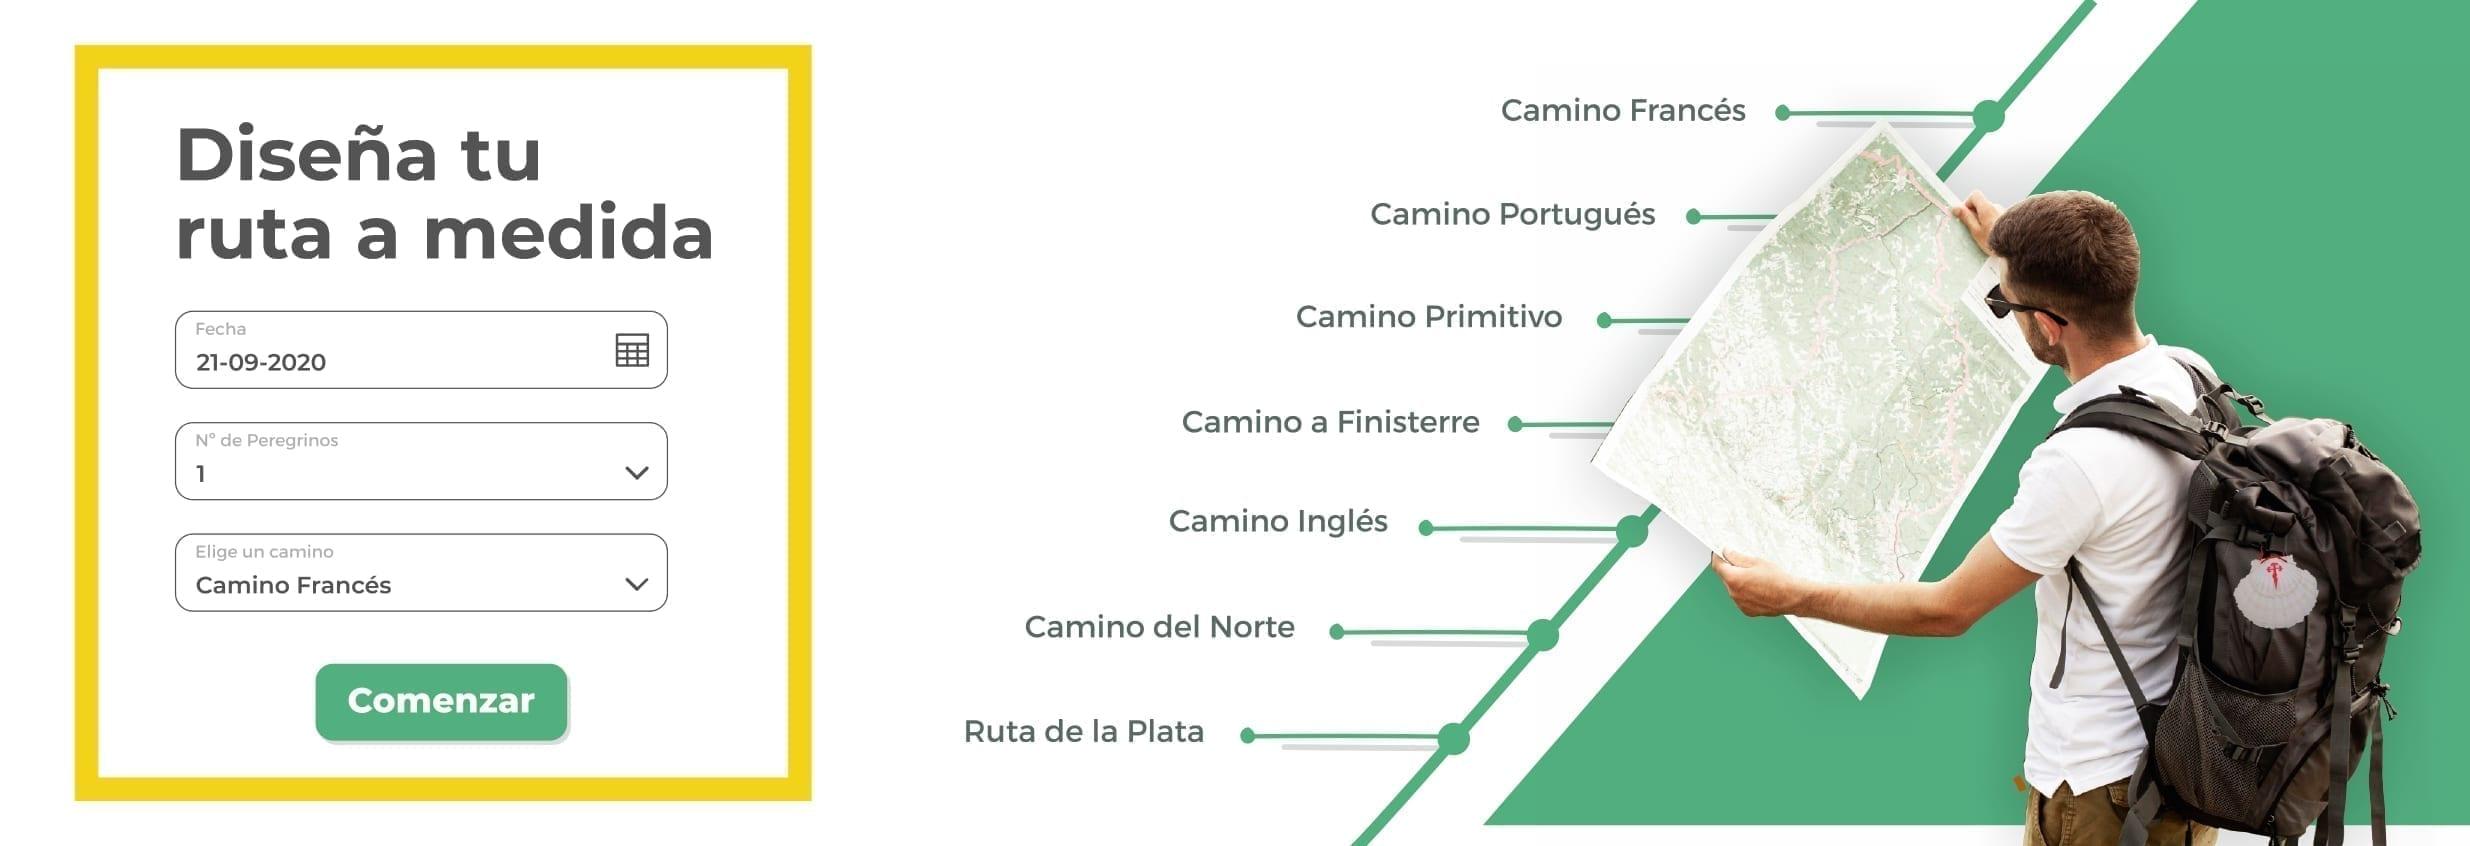 Diseña tu ruta a medida